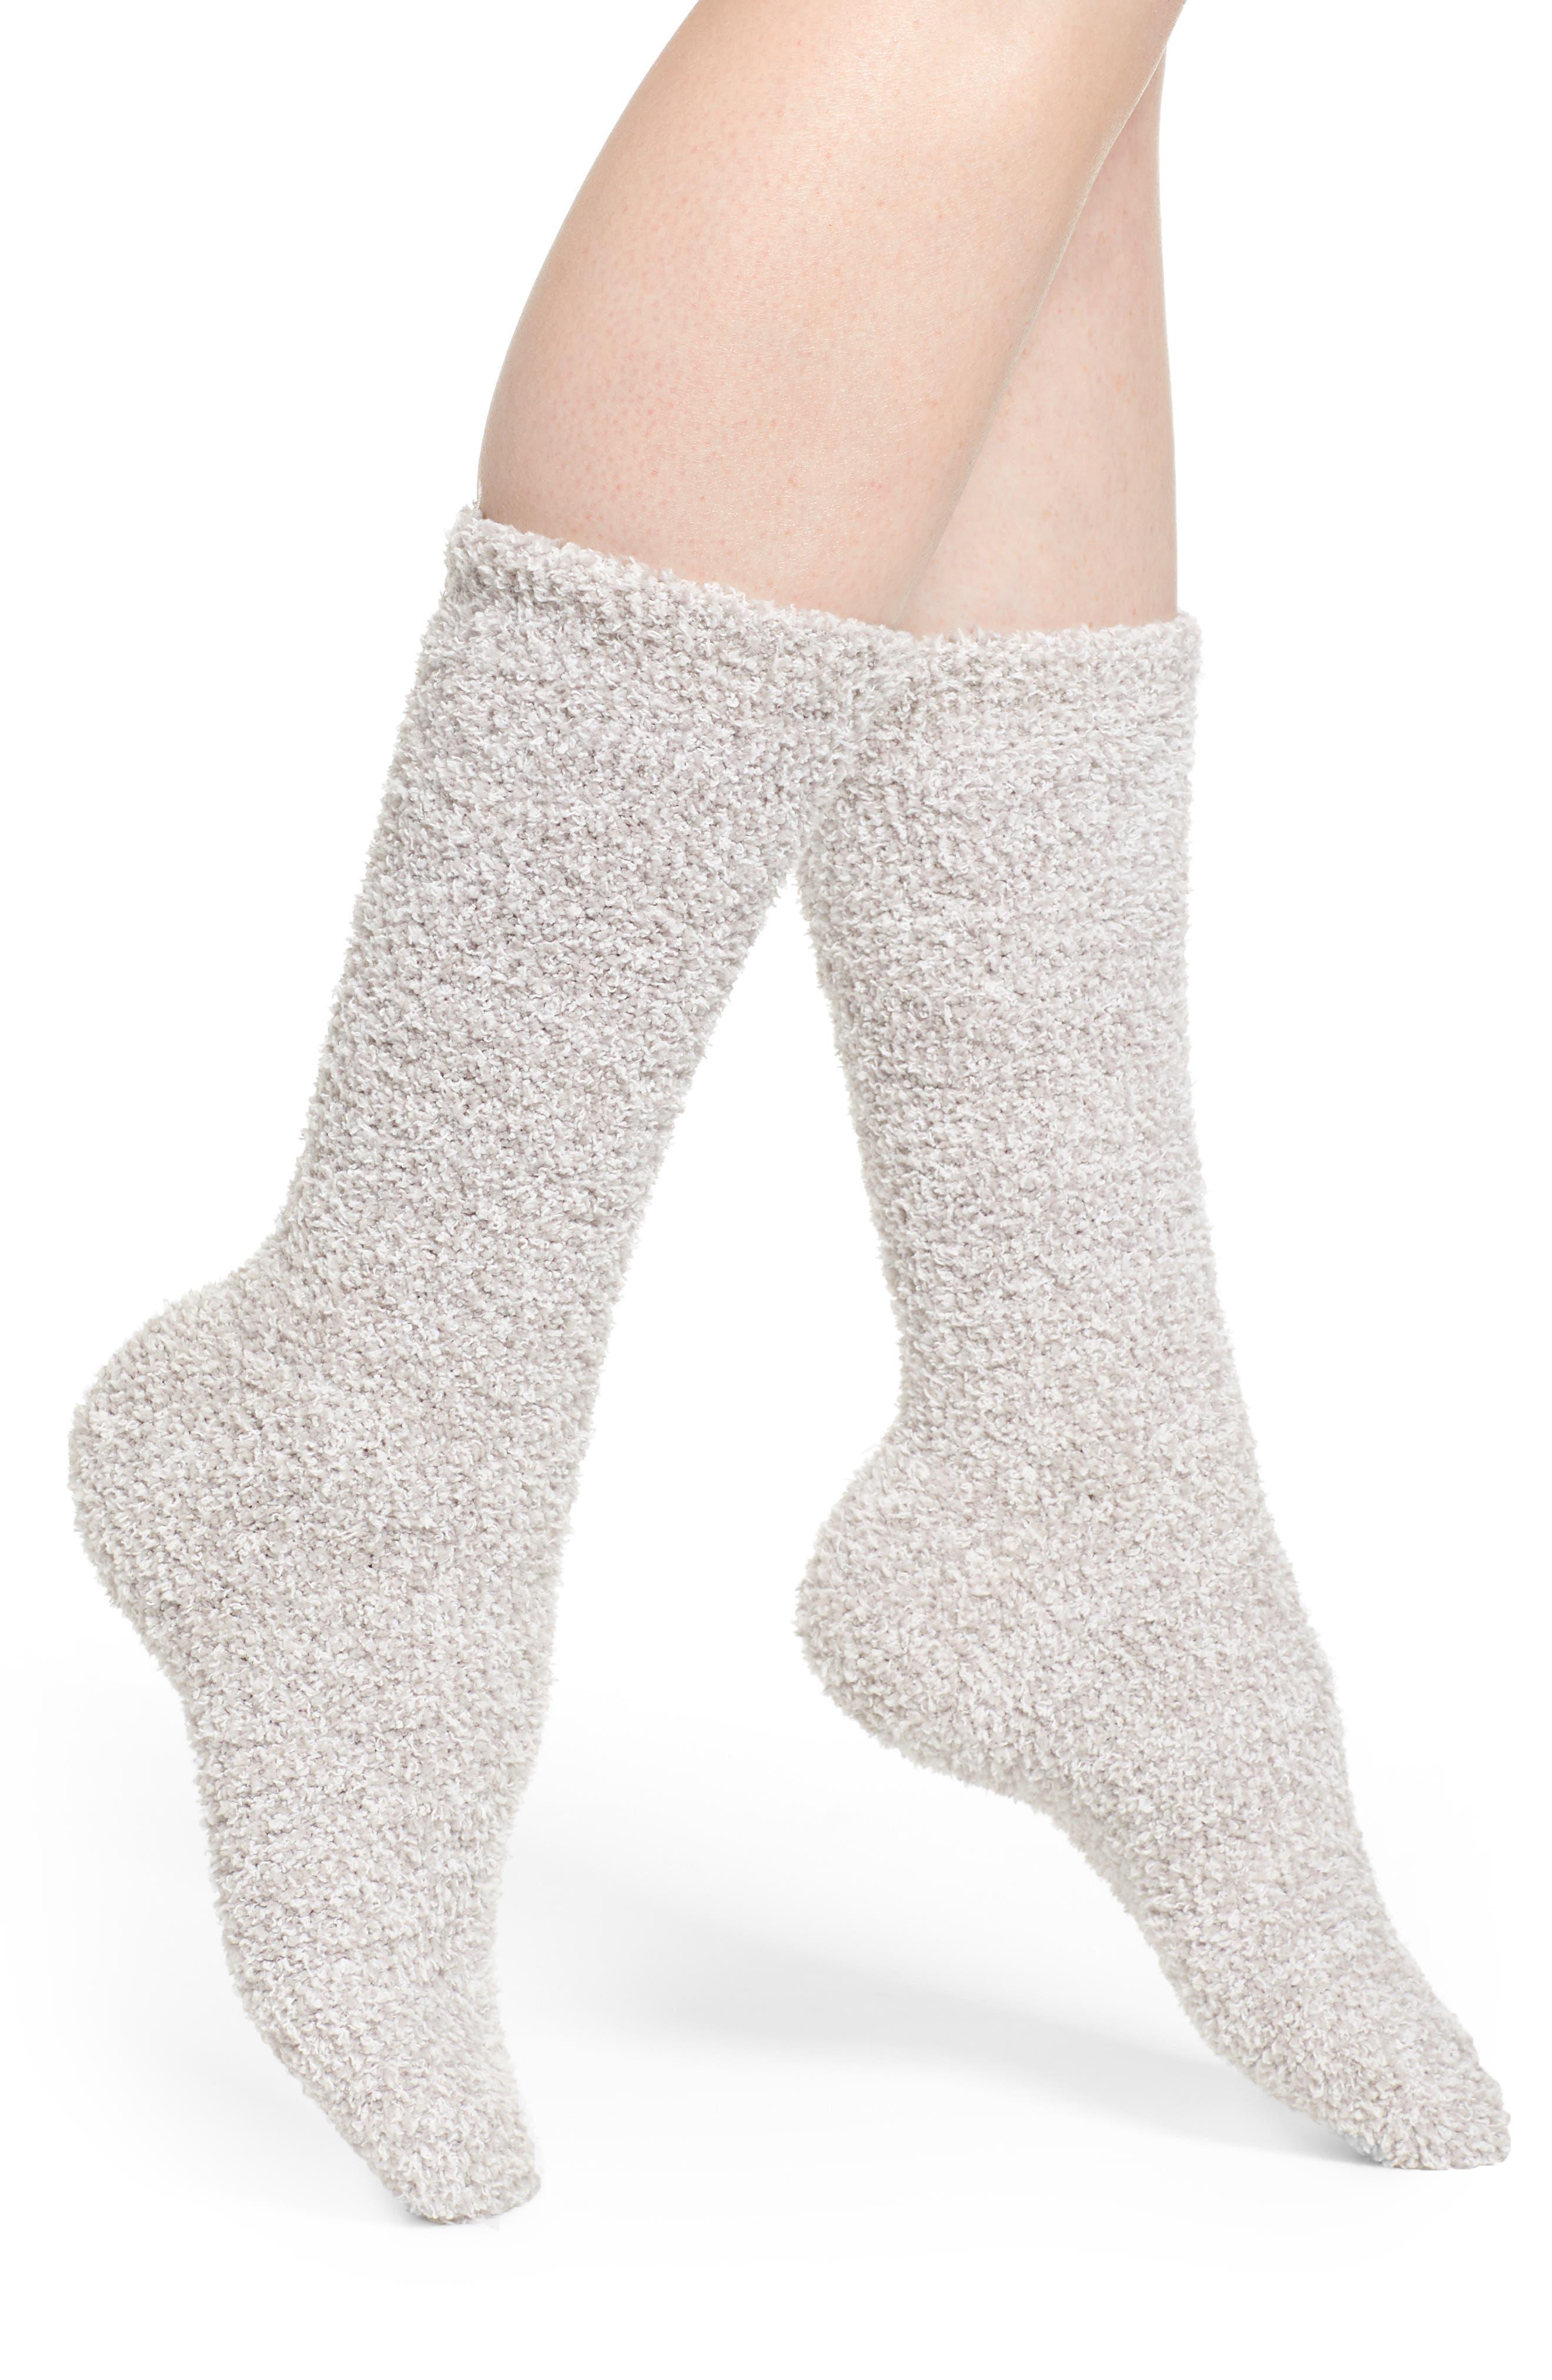 CozyChic<sup>®</sup> Socks,                             Main thumbnail 1, color,                             020